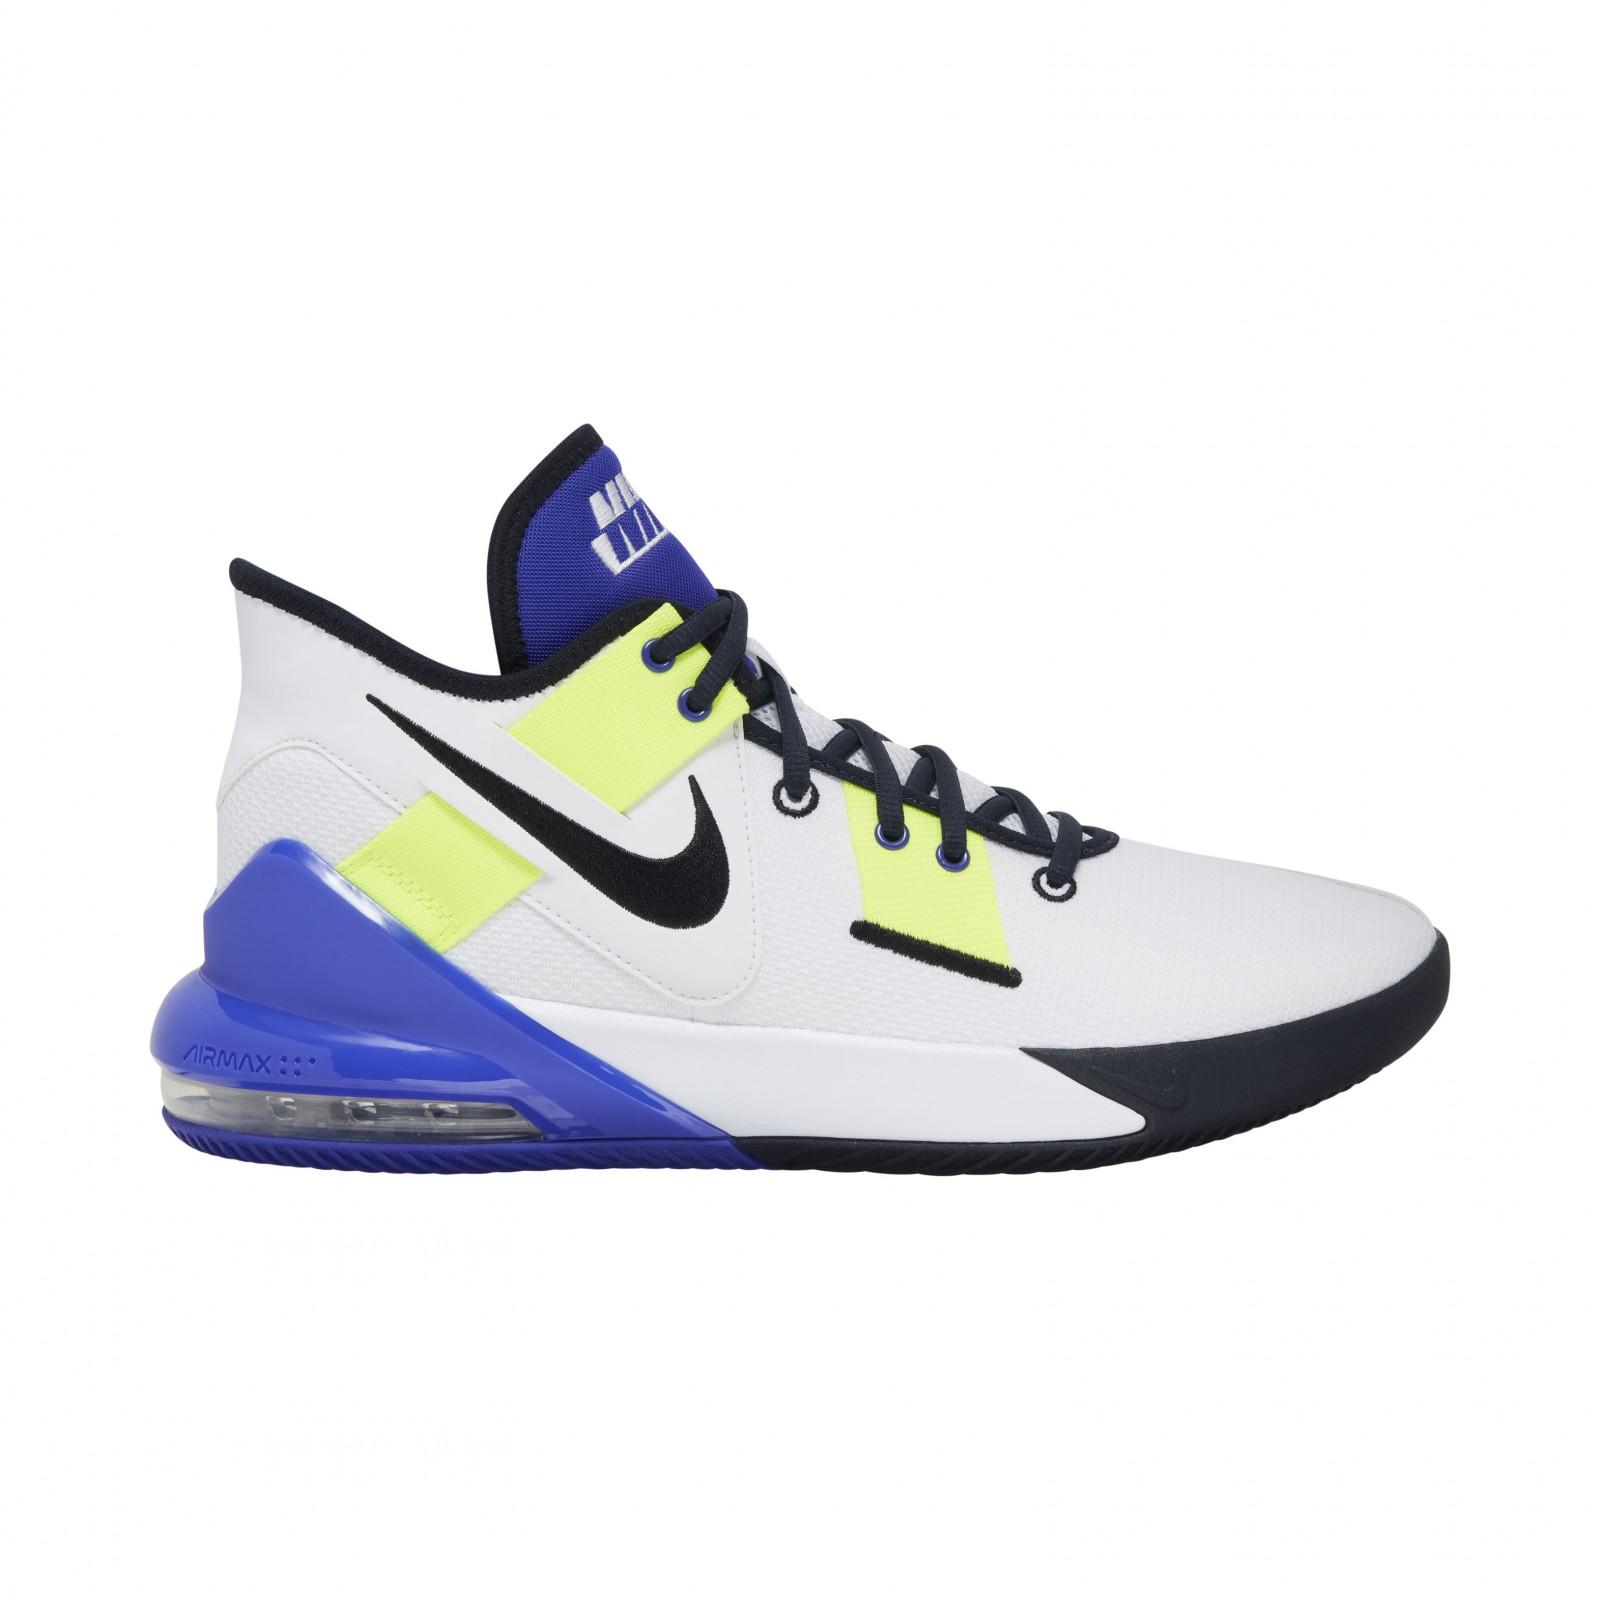 Nike Air Max Impact 2 WHITE